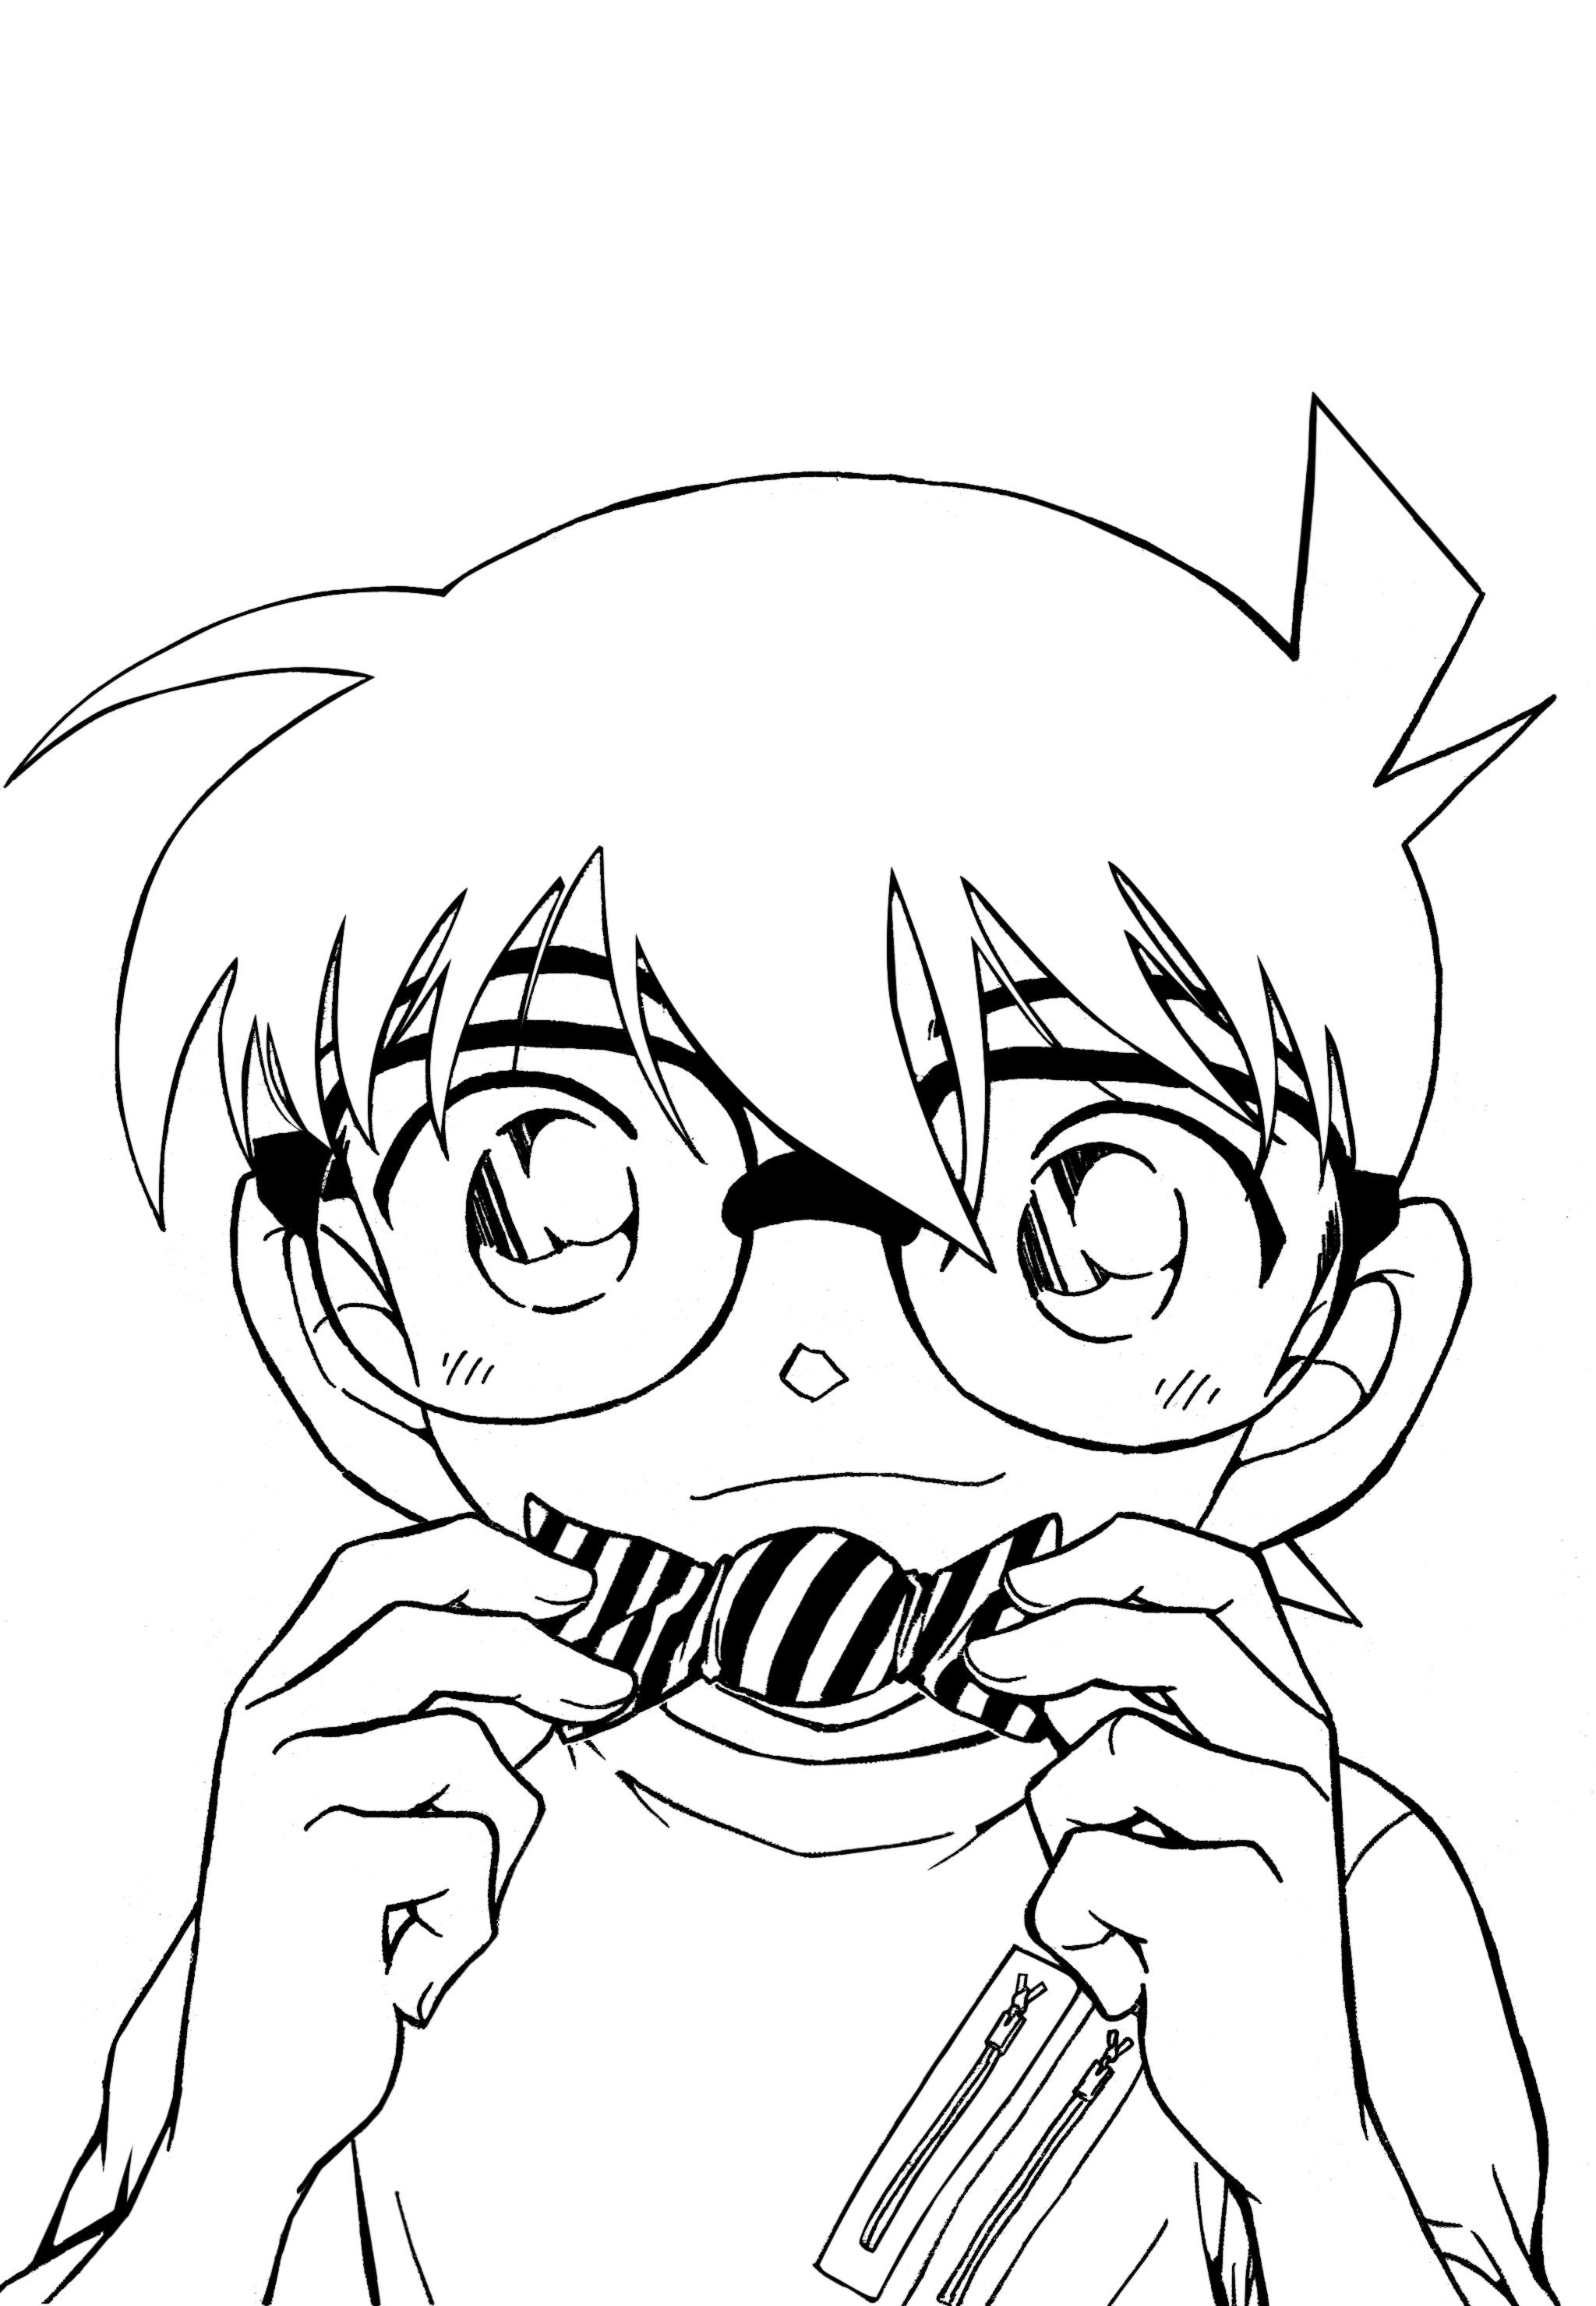 Conan-coloring-book